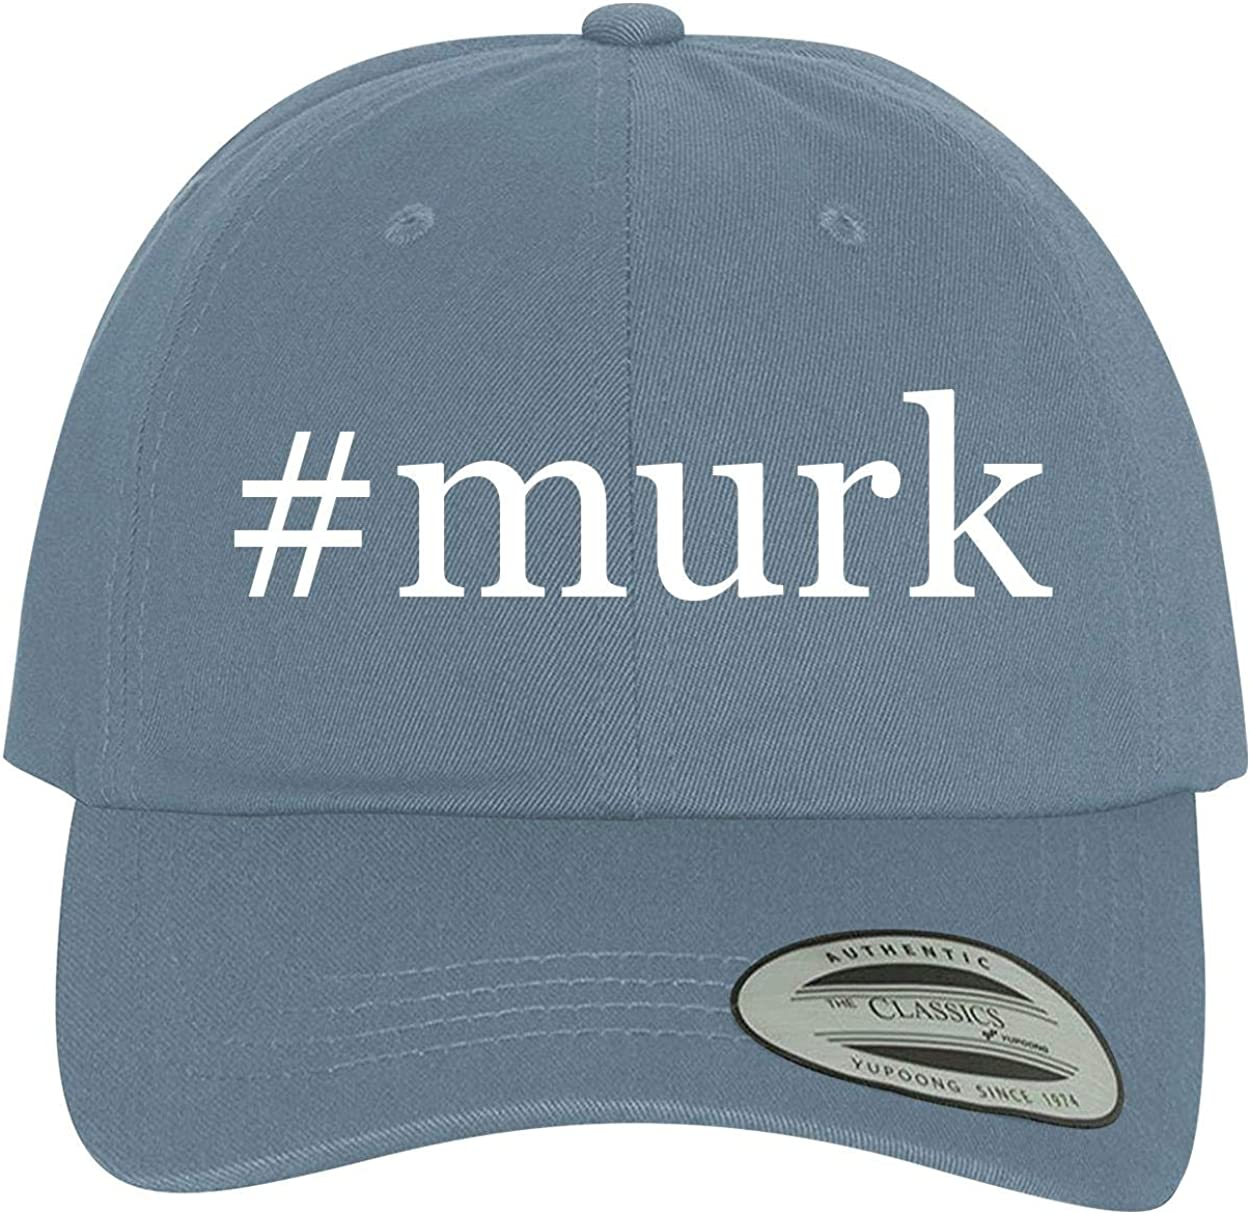 Comfortable Dad Hat Baseball Cap BH Cool Designs #Murk